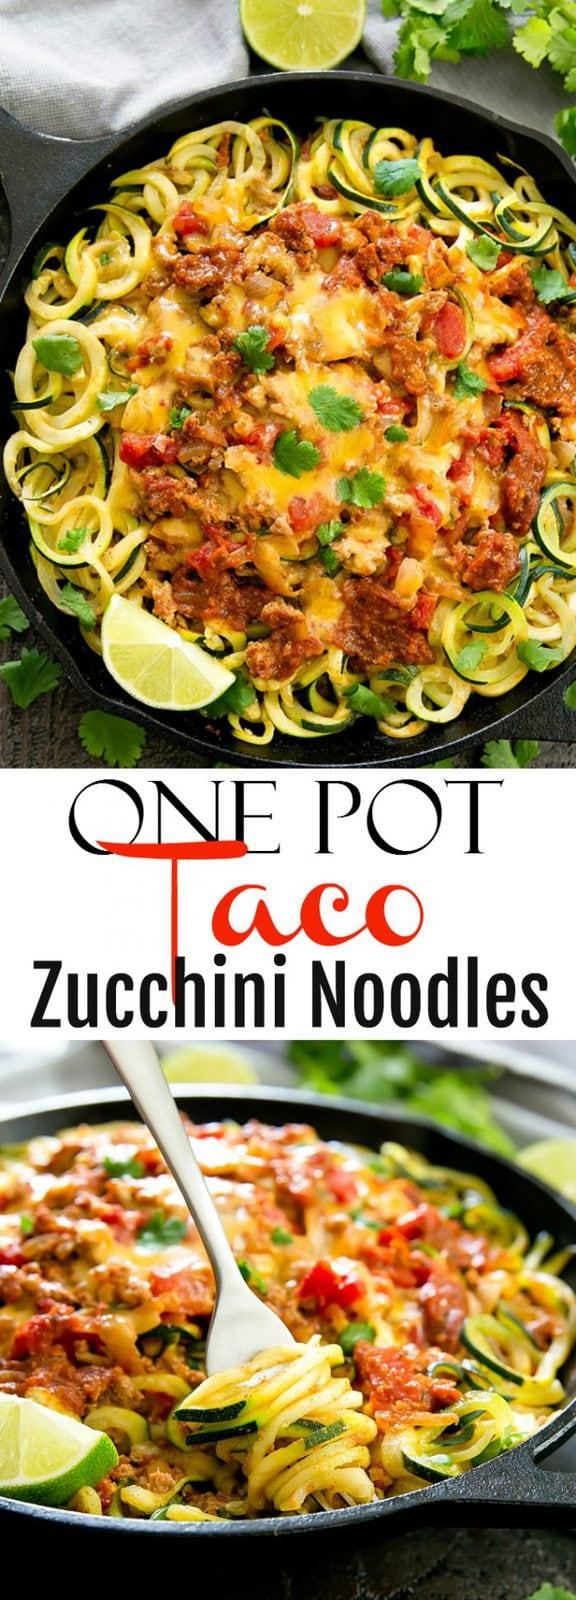 One Pot Cheesy Taco Zucchini Noodles